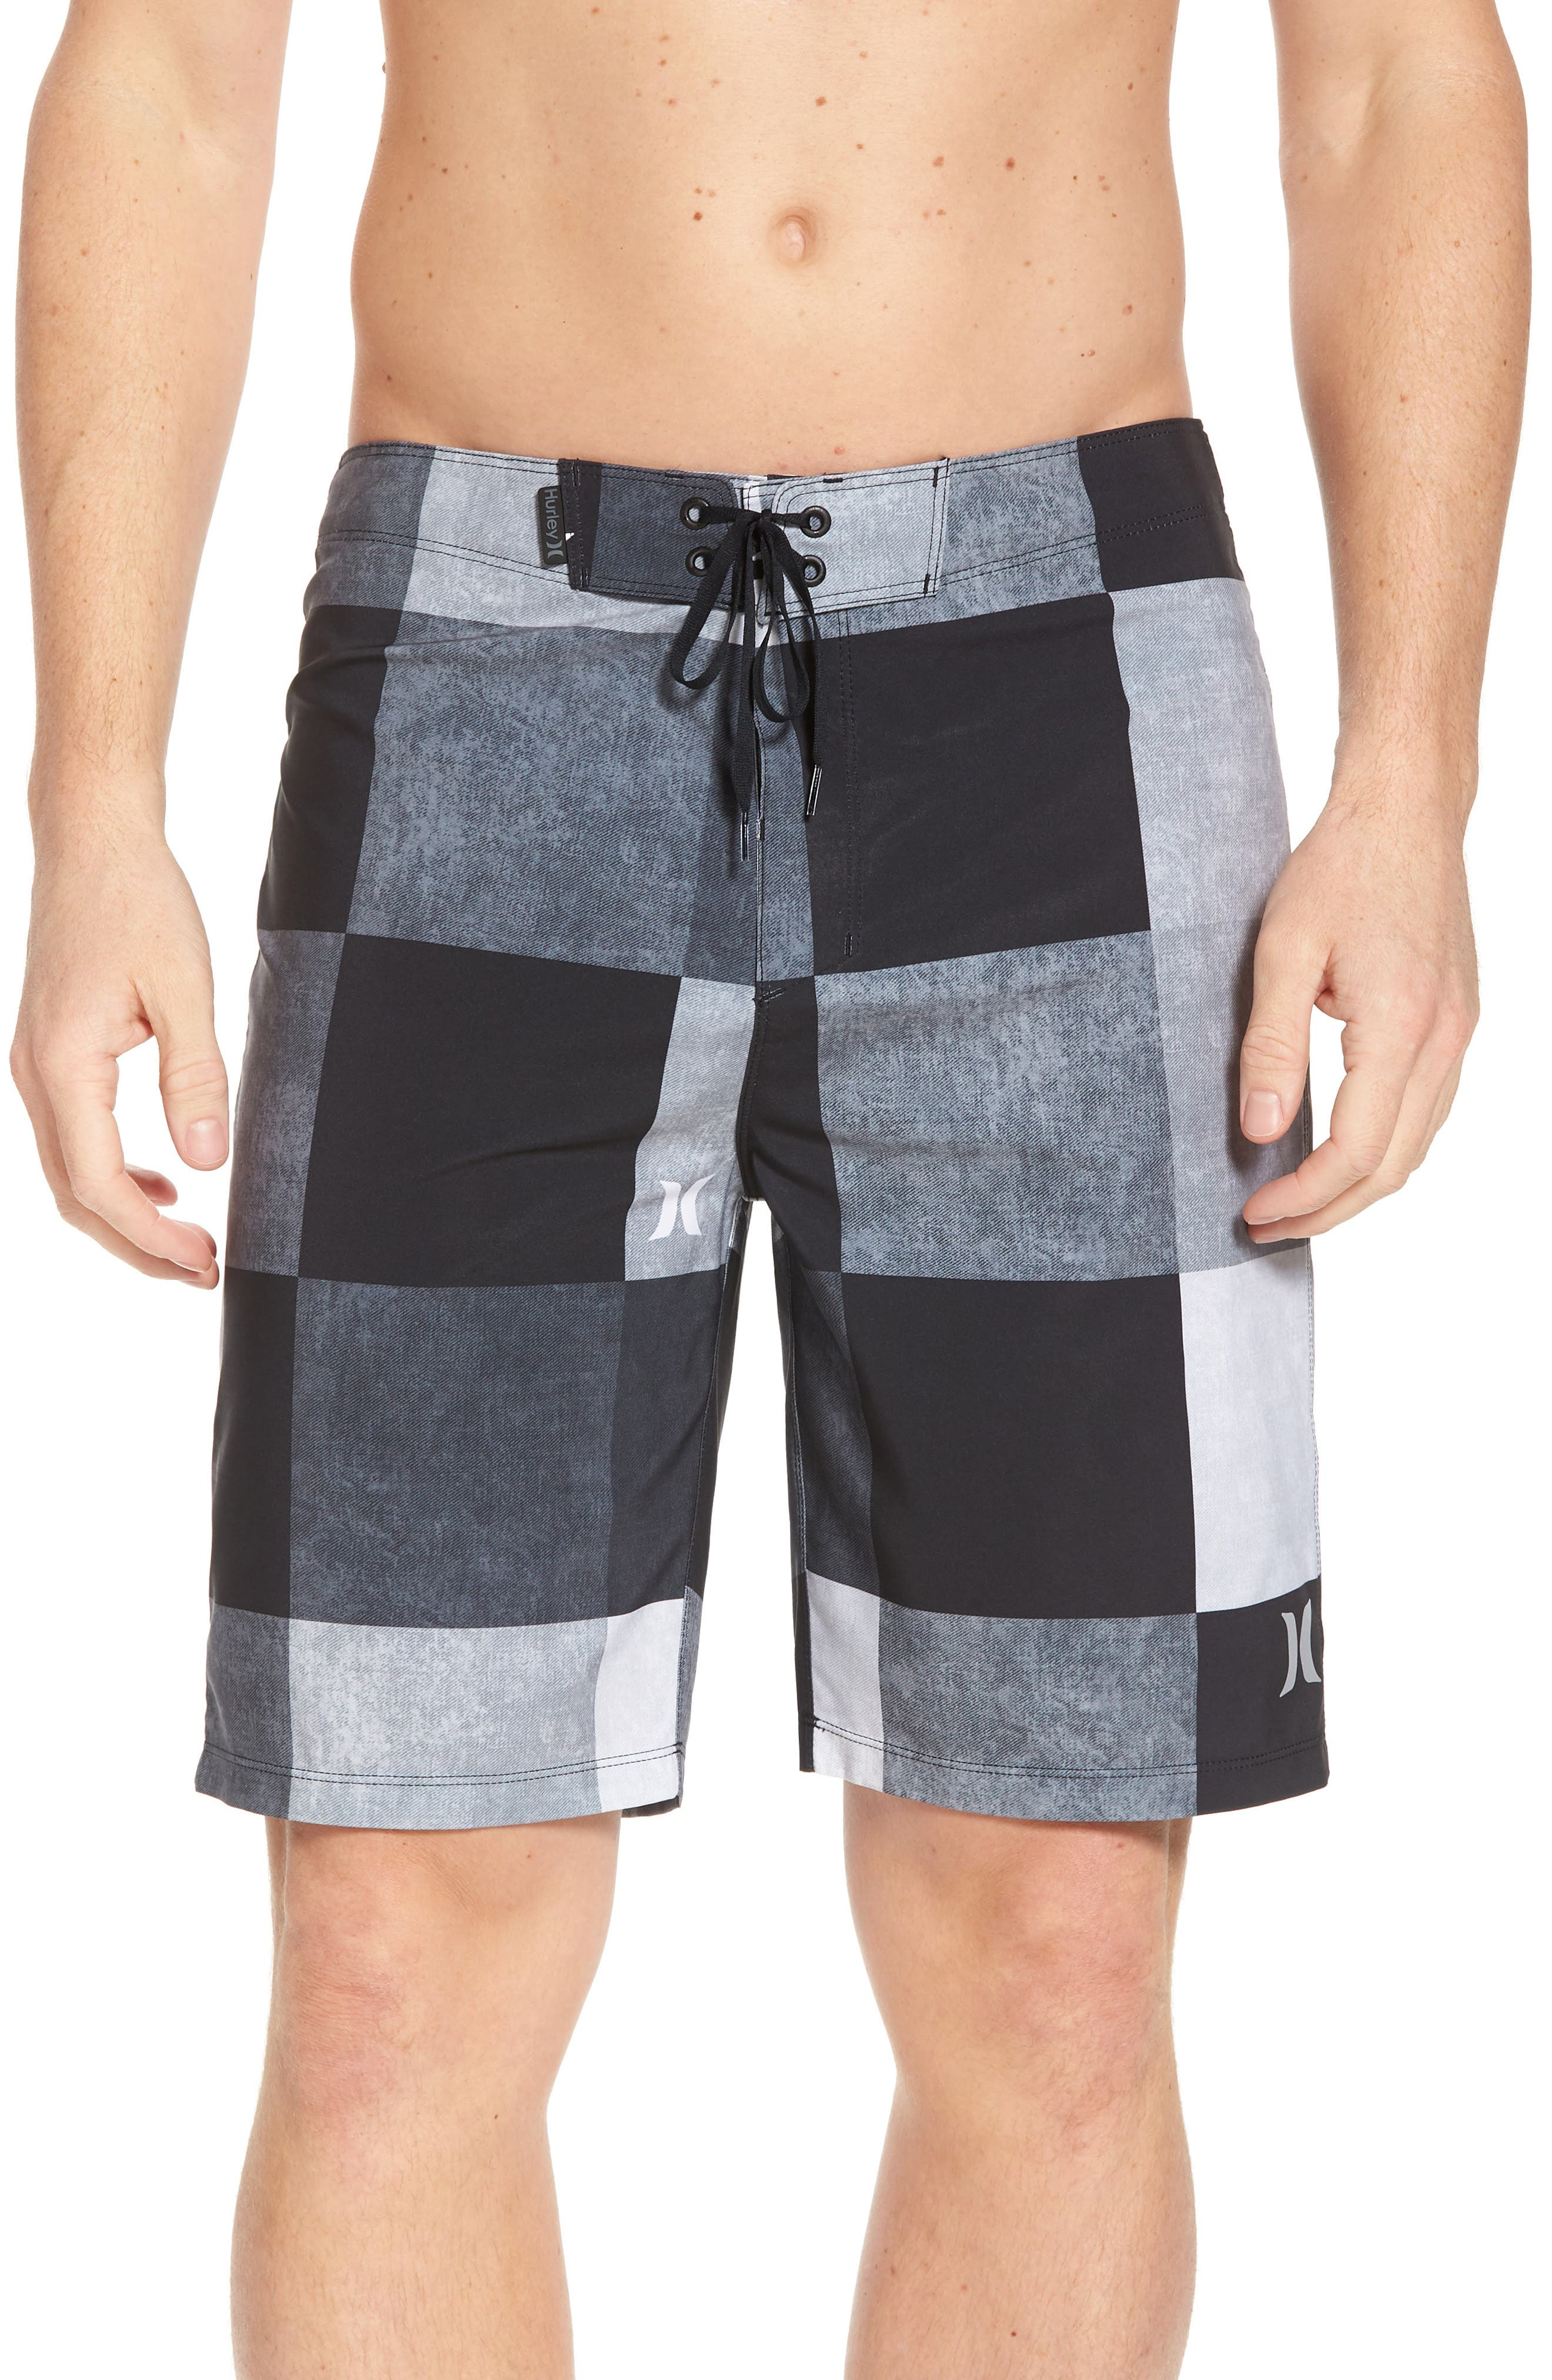 Phantom Kingsroad Board Shorts,                         Main,                         color, BLACK